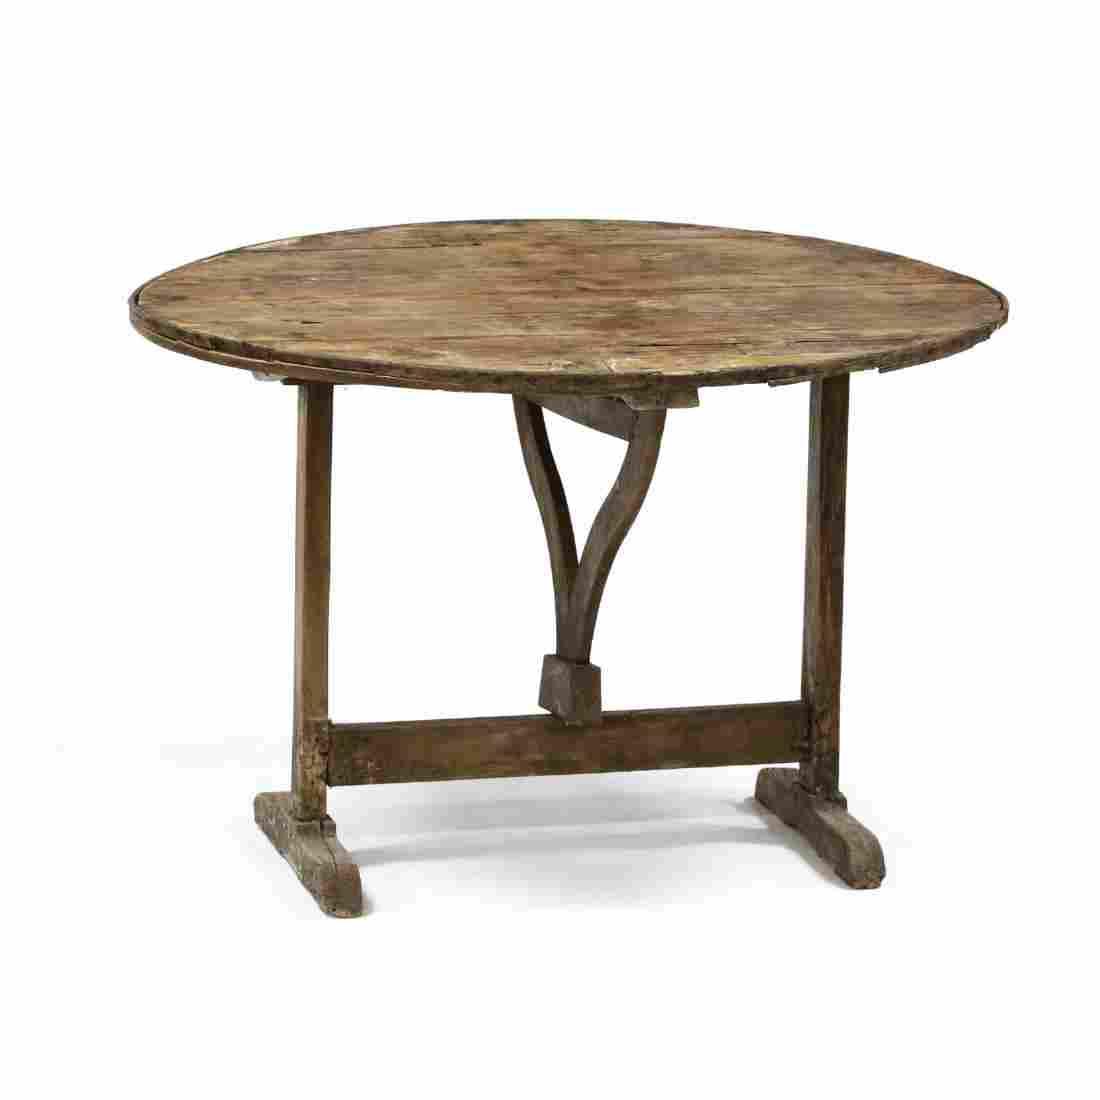 Antique Continental Primitive Tilt Top Breakfast Table